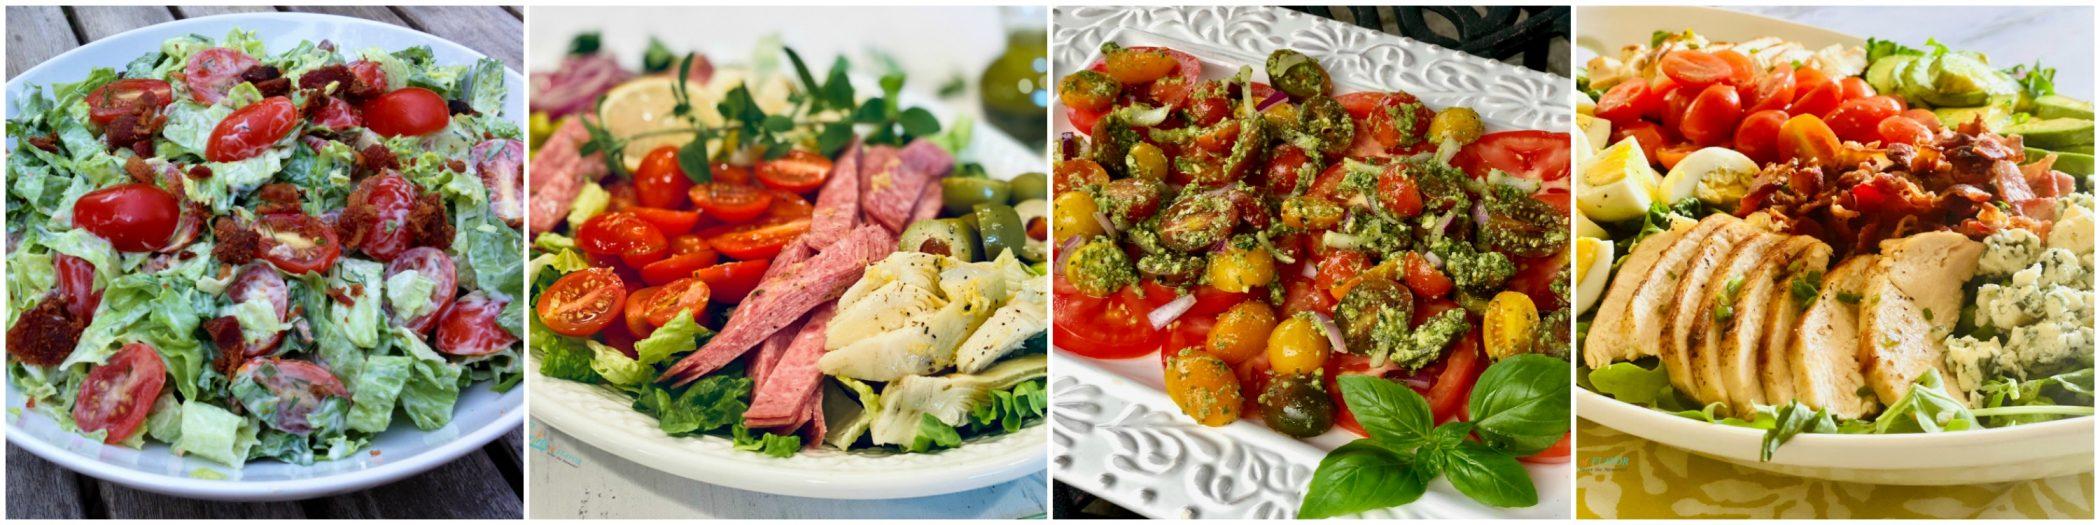 Left to right: BLT Salad; Italian Chopped Salad: Tomato Pesto Salad; Cobb Salad